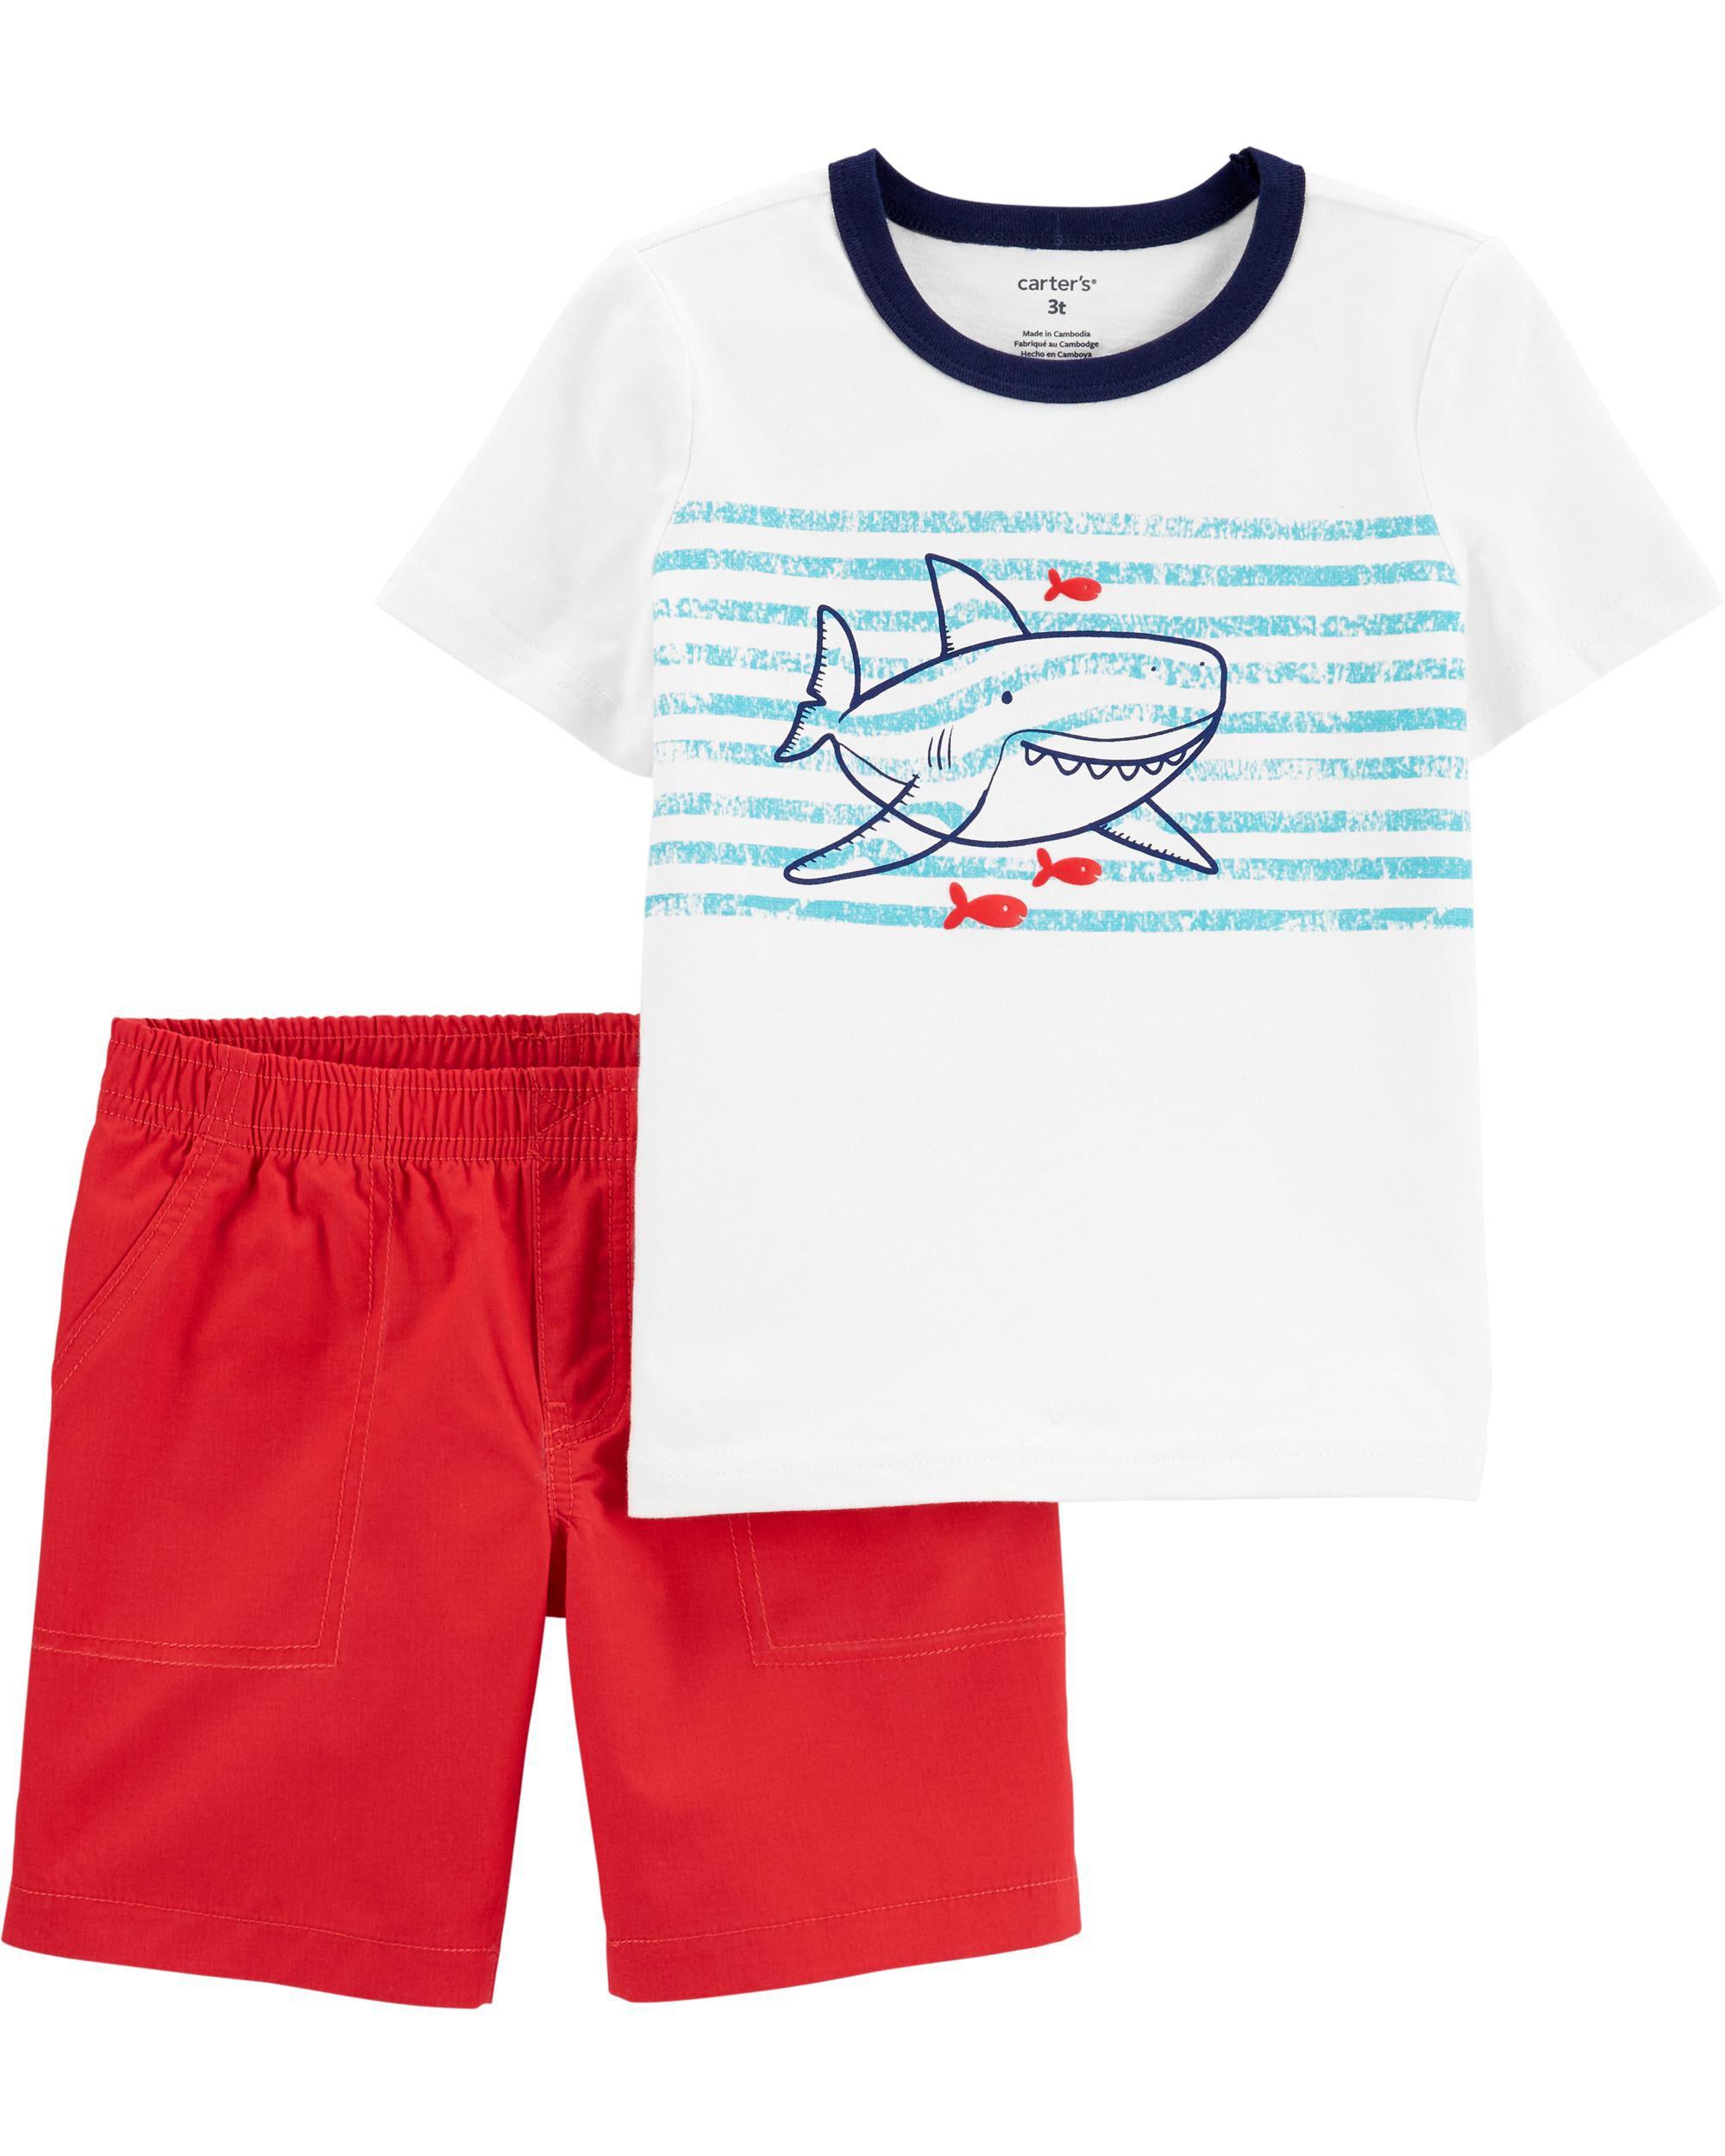 *DOORBUSTER* 2-Piece Striped Shark Jersey Tee & Poplin Short Set